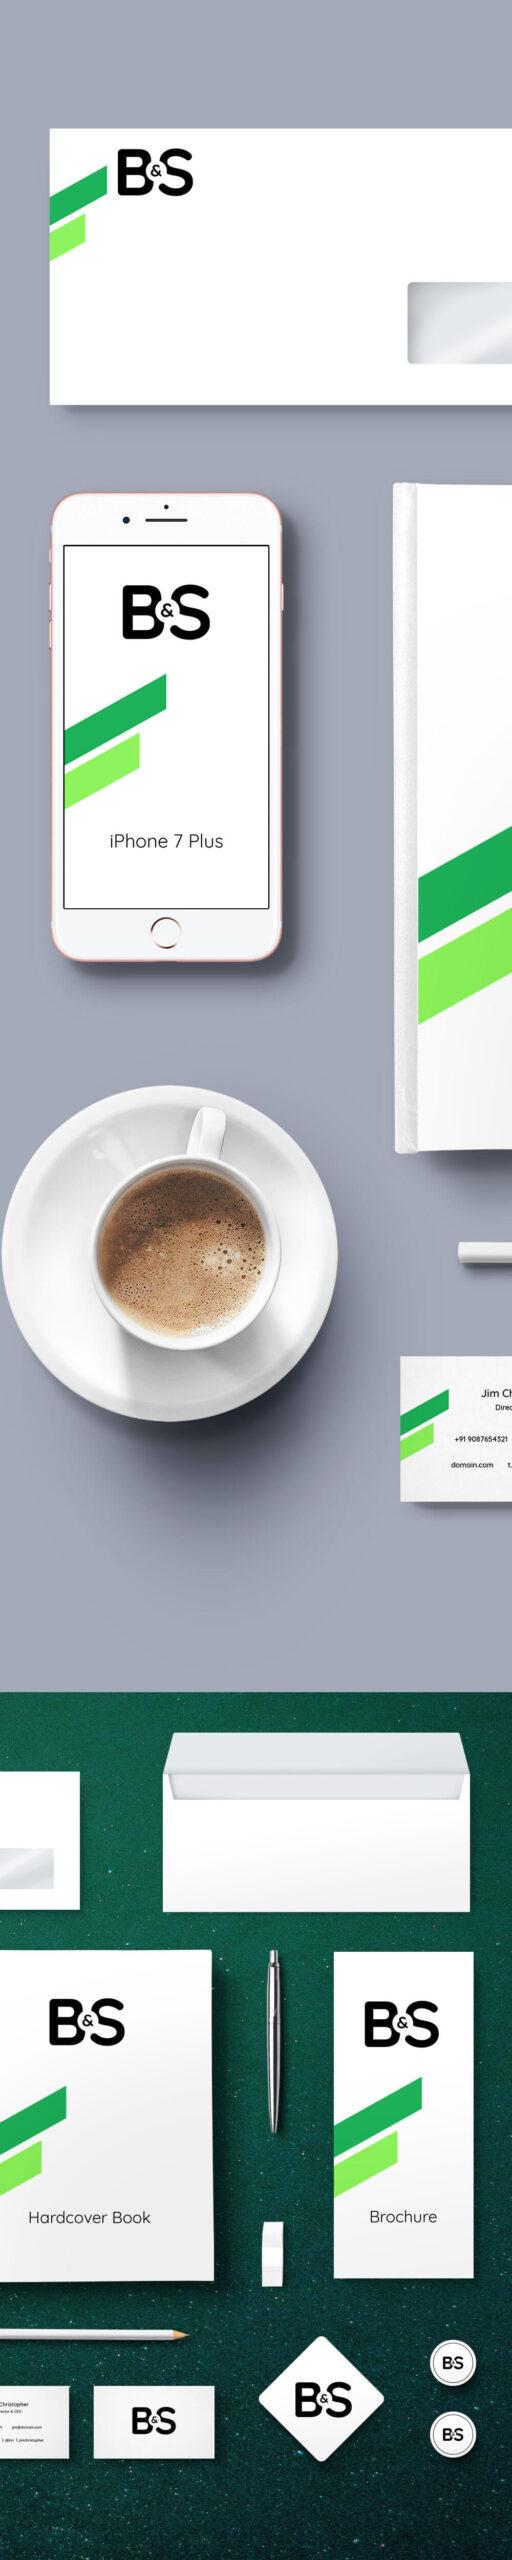 Free Branding & Stationery Mockup PSD Template